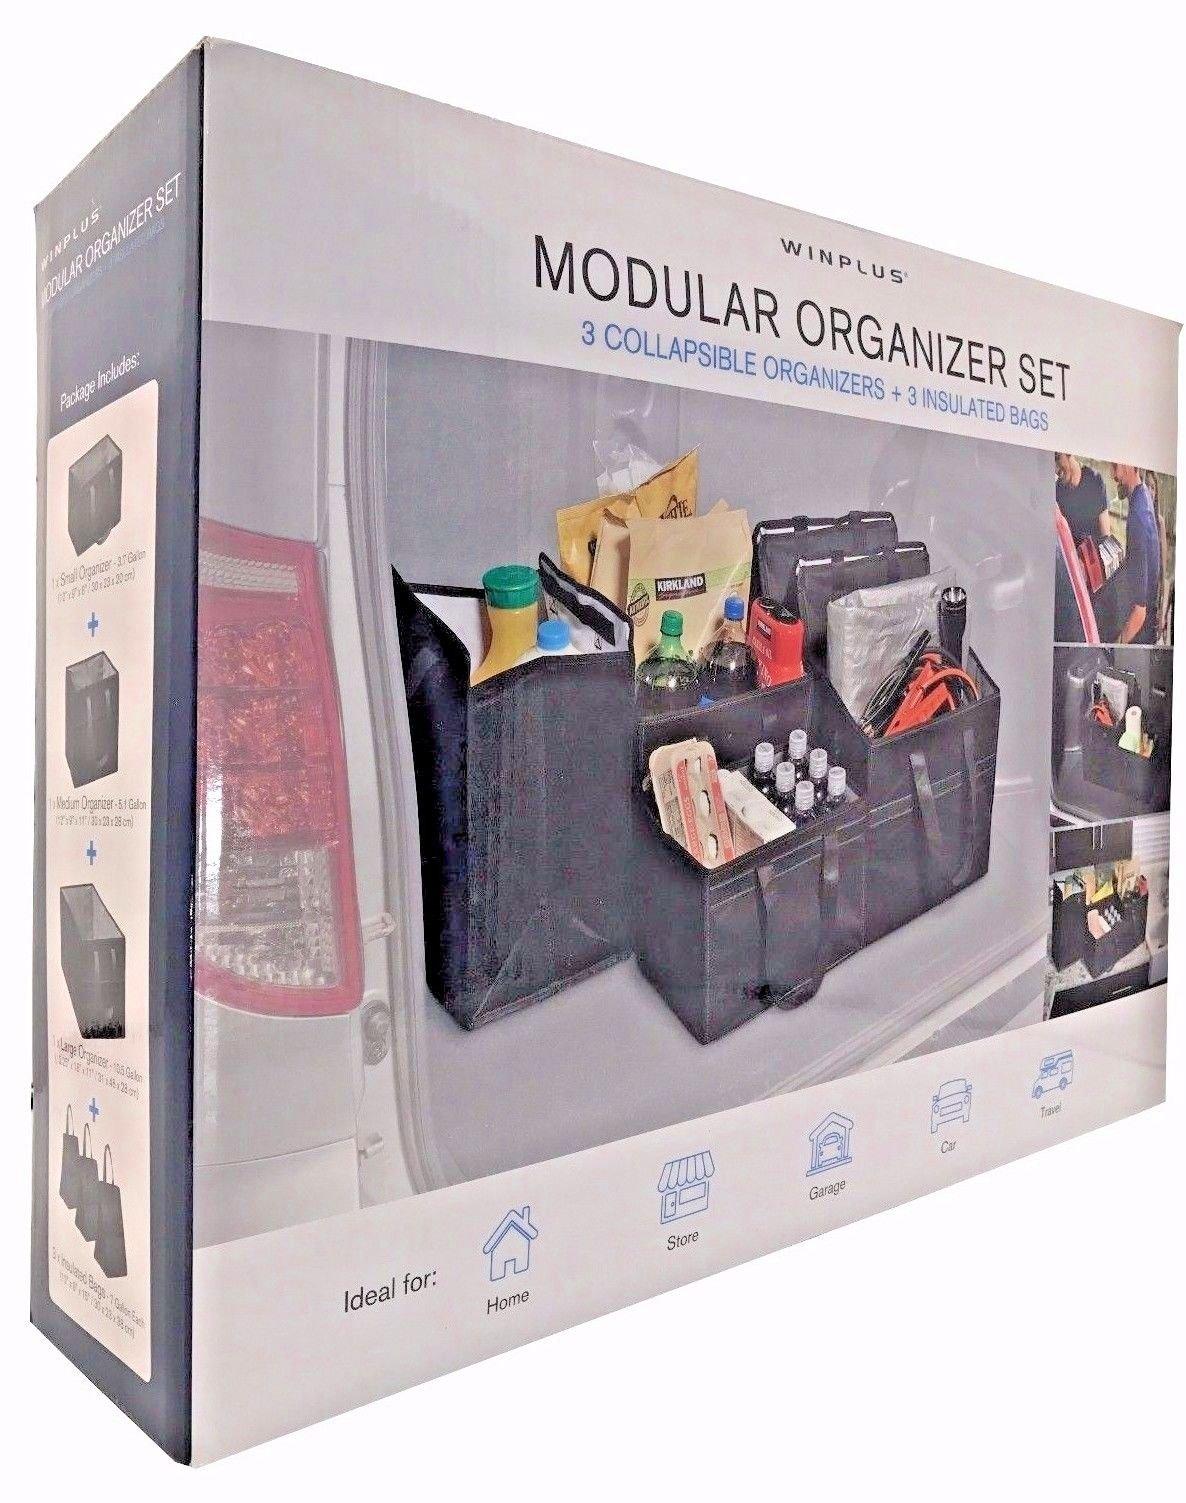 Winplus Modular Organizer Set 3 Collapsible Organizers + 3 Insulated Bags